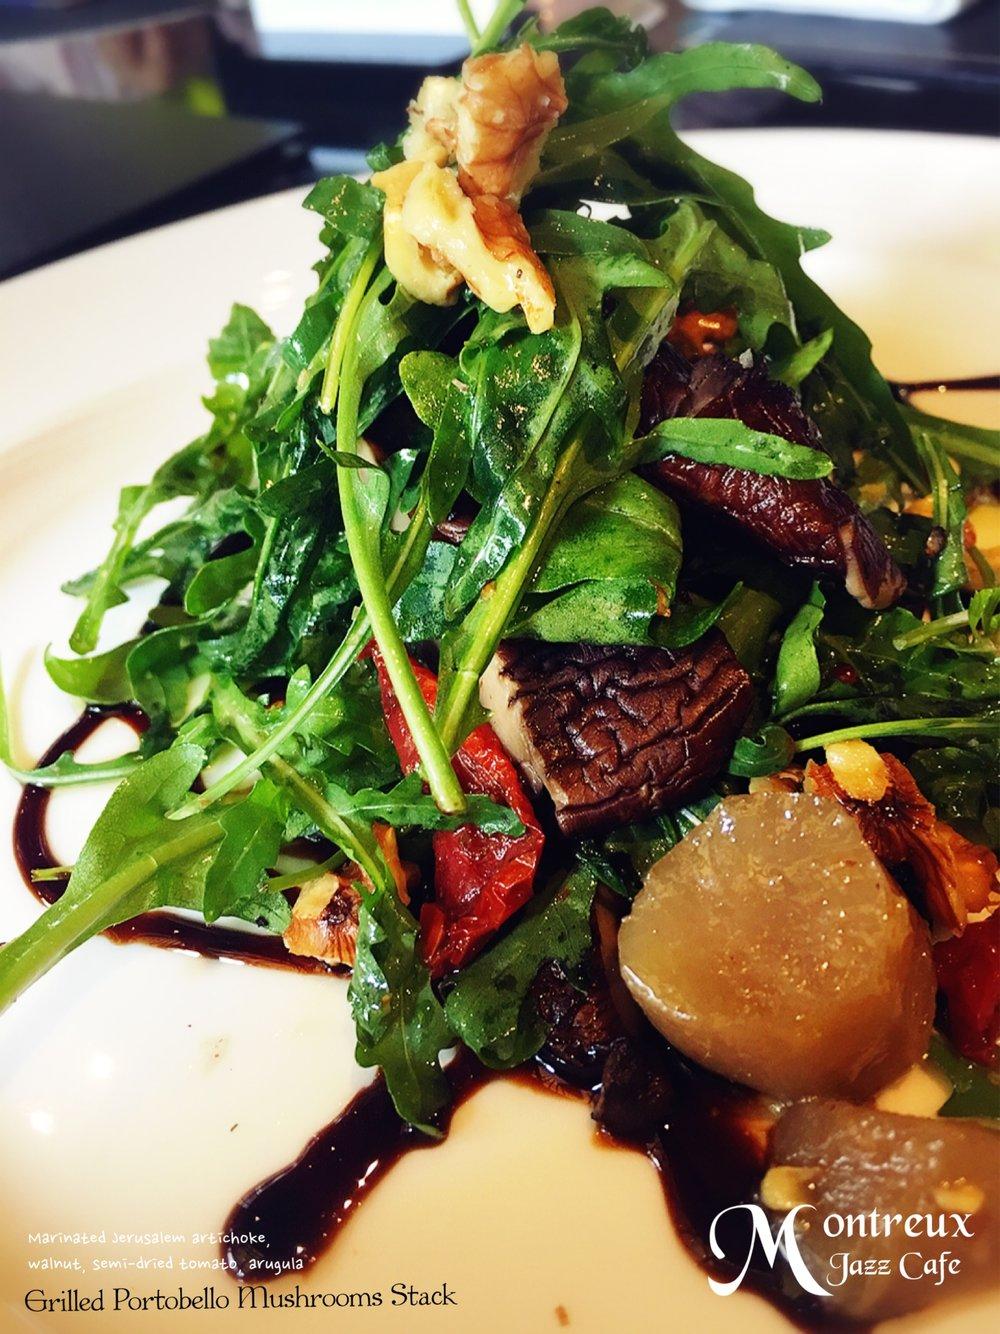 Grilled Portobello Mushrooms Stack